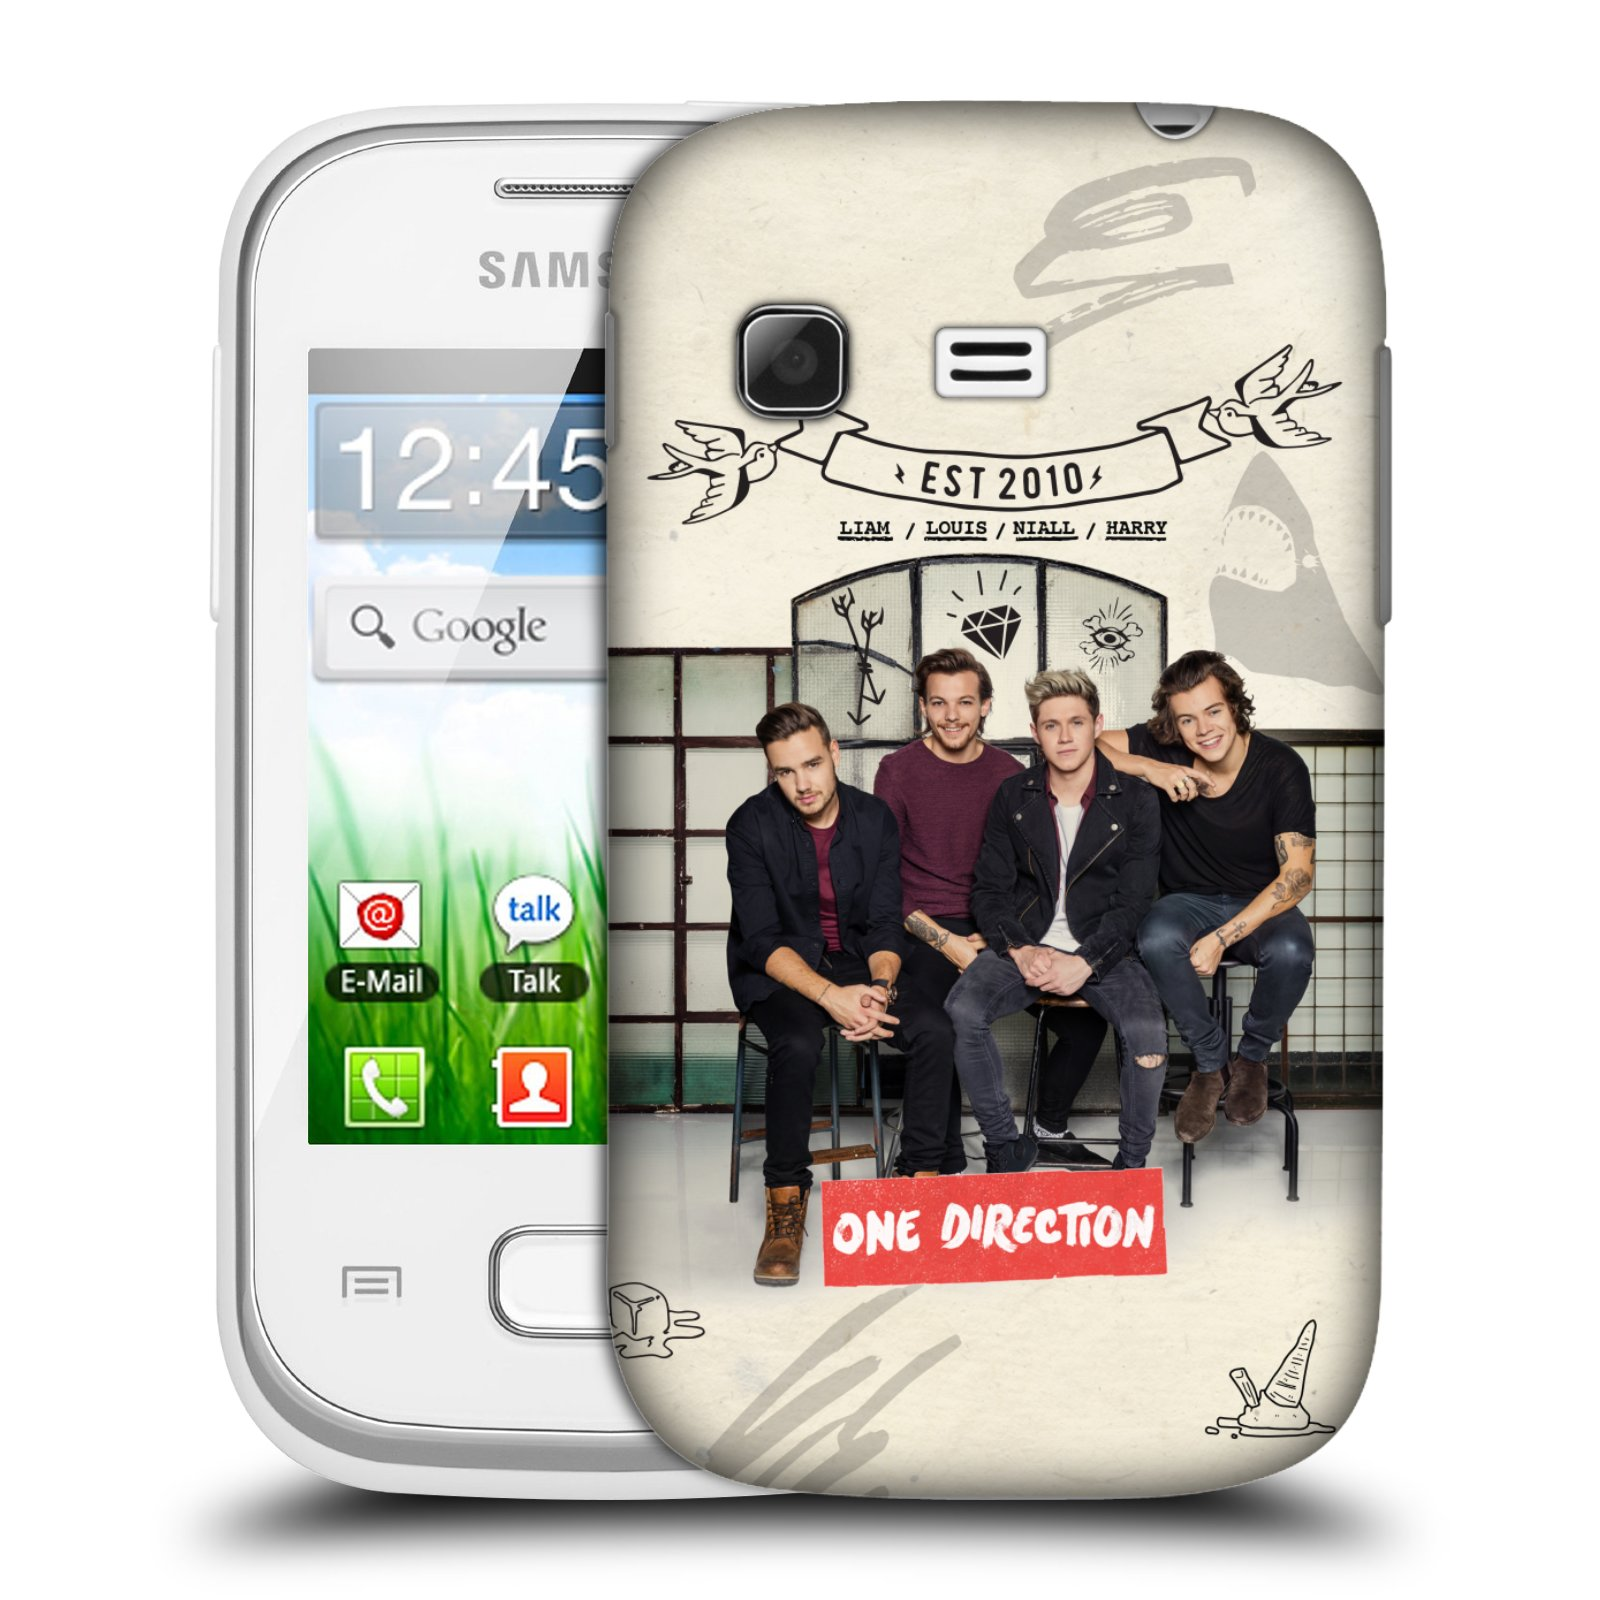 Plastové pouzdro na mobil Samsung Galaxy Pocket HEAD CASE One Direction - EST 2010 (Kryt či obal One Direction Official na mobilní telefon Samsung Galaxy Pocket GT-S5300)